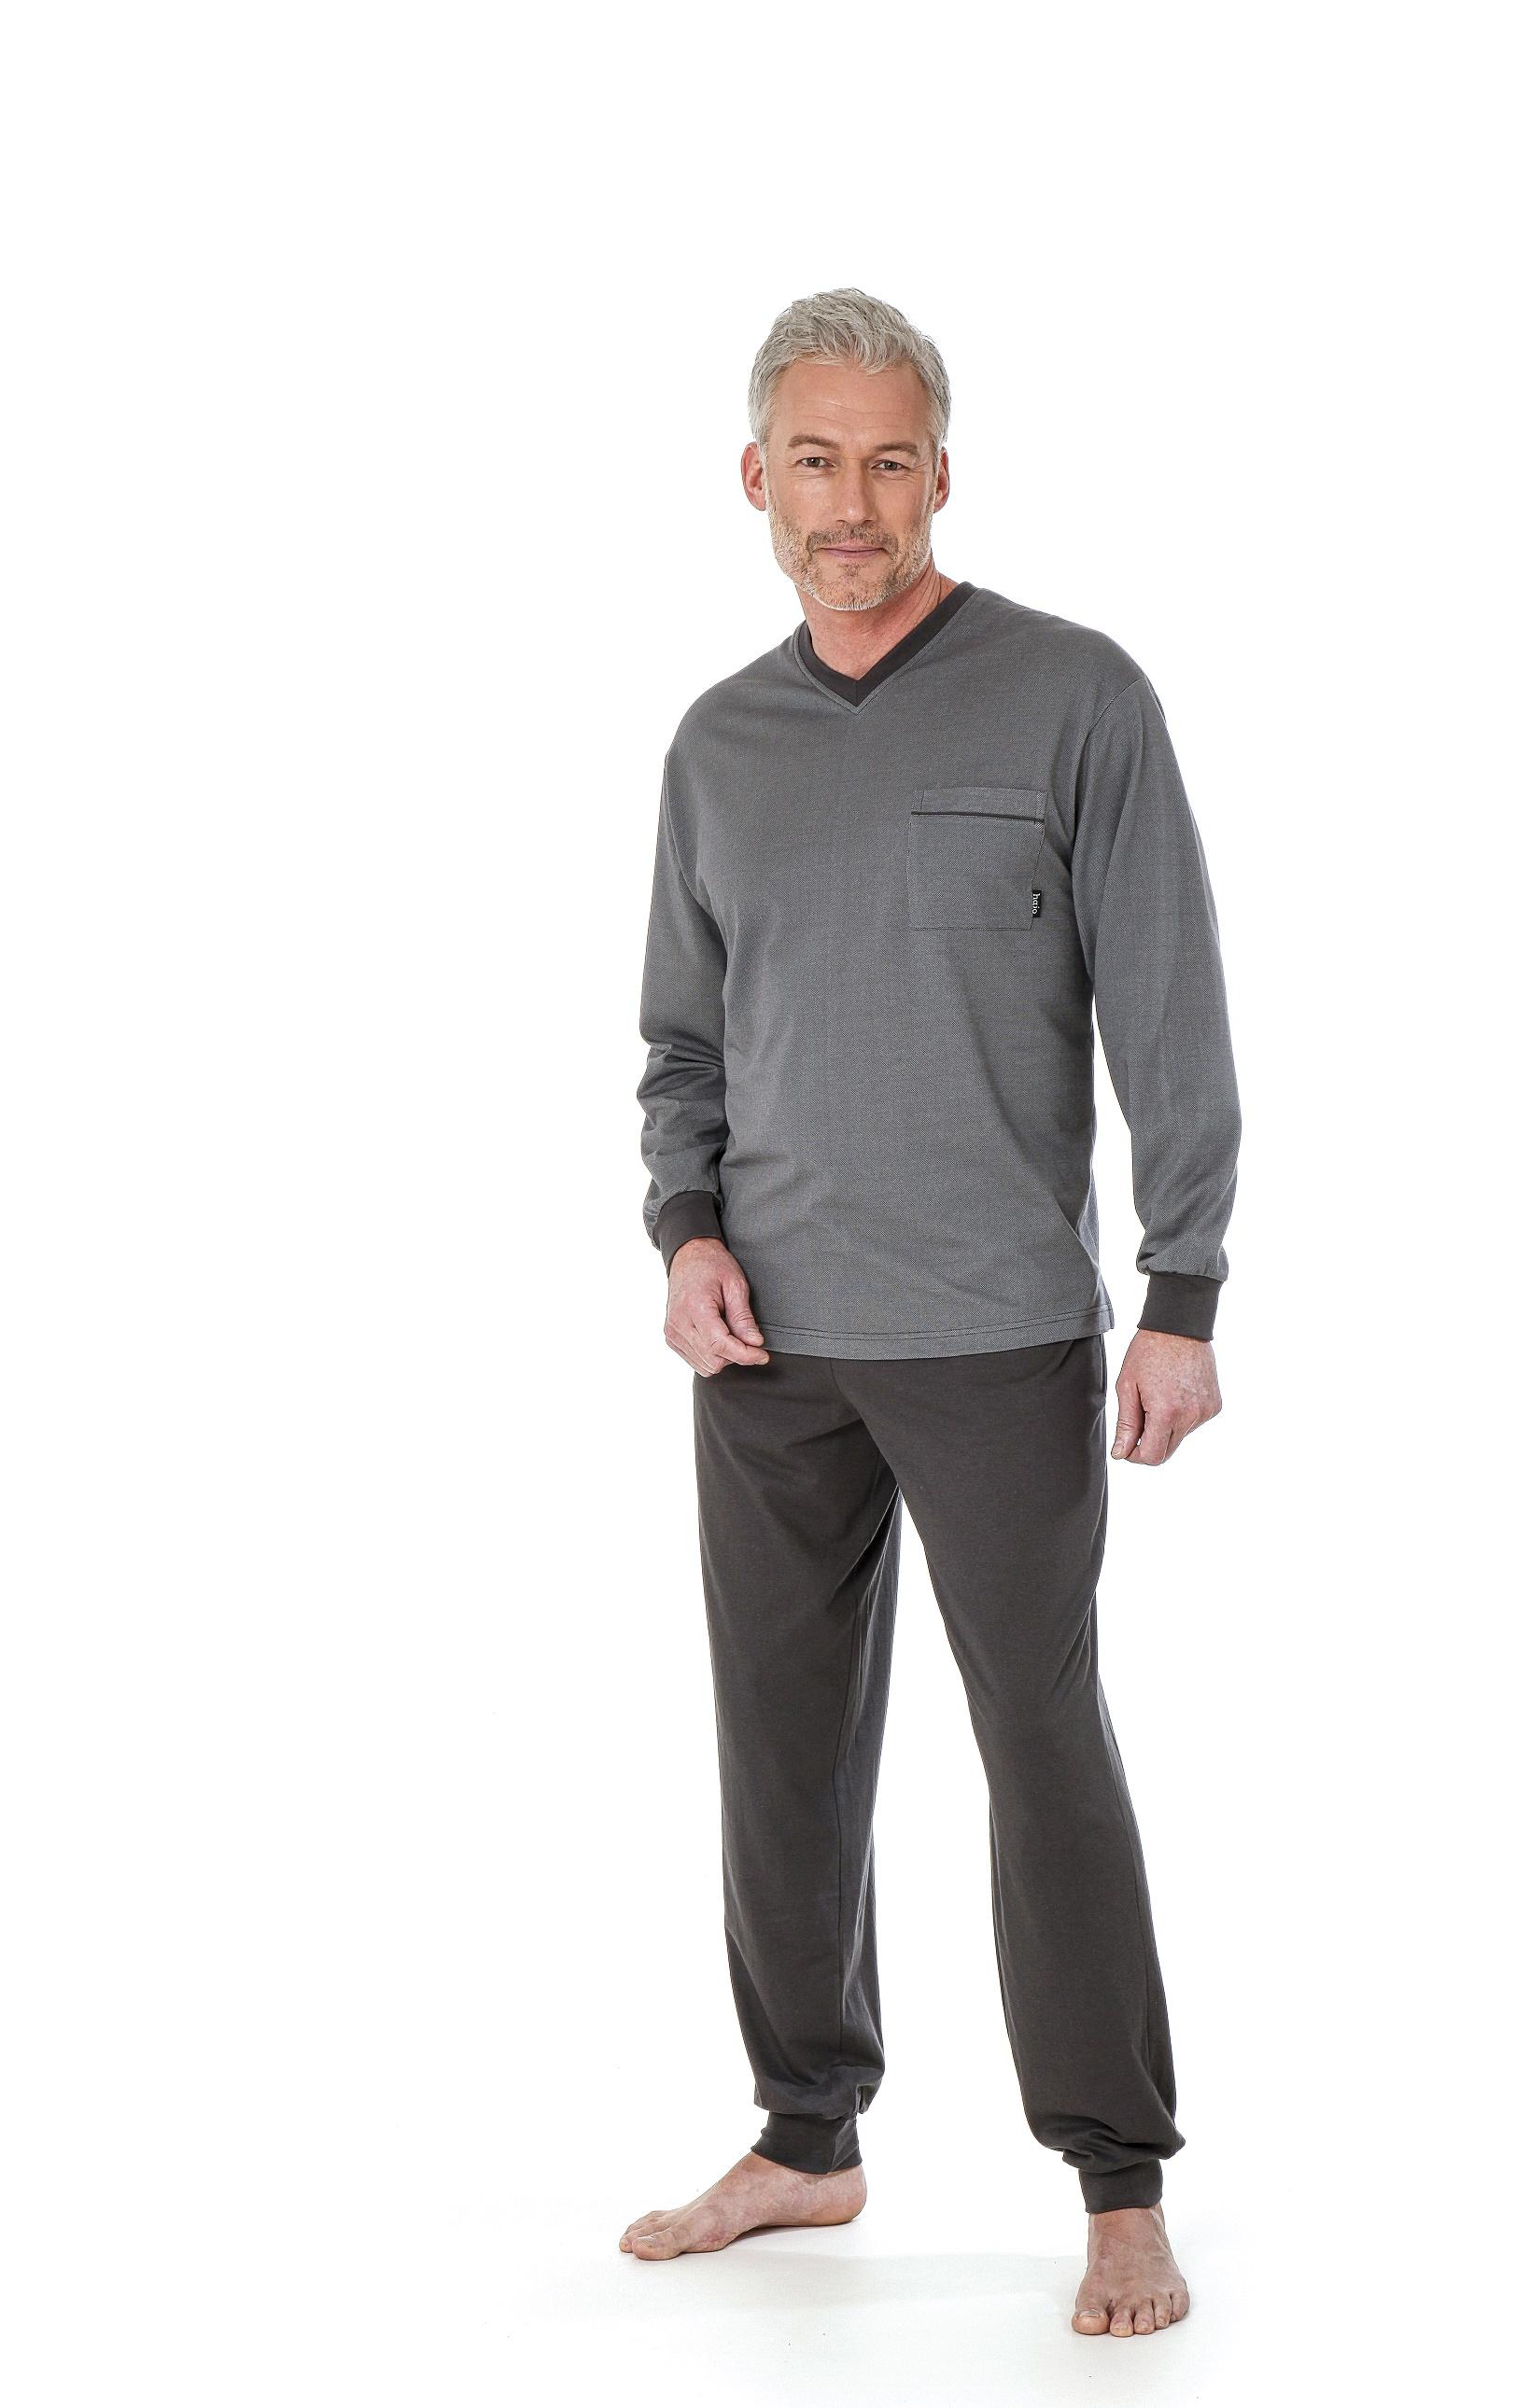 Schlafanzug Langarm Gr Pyjama Jersey S,M,L,XL,XXL uni hellgrau Bündchen